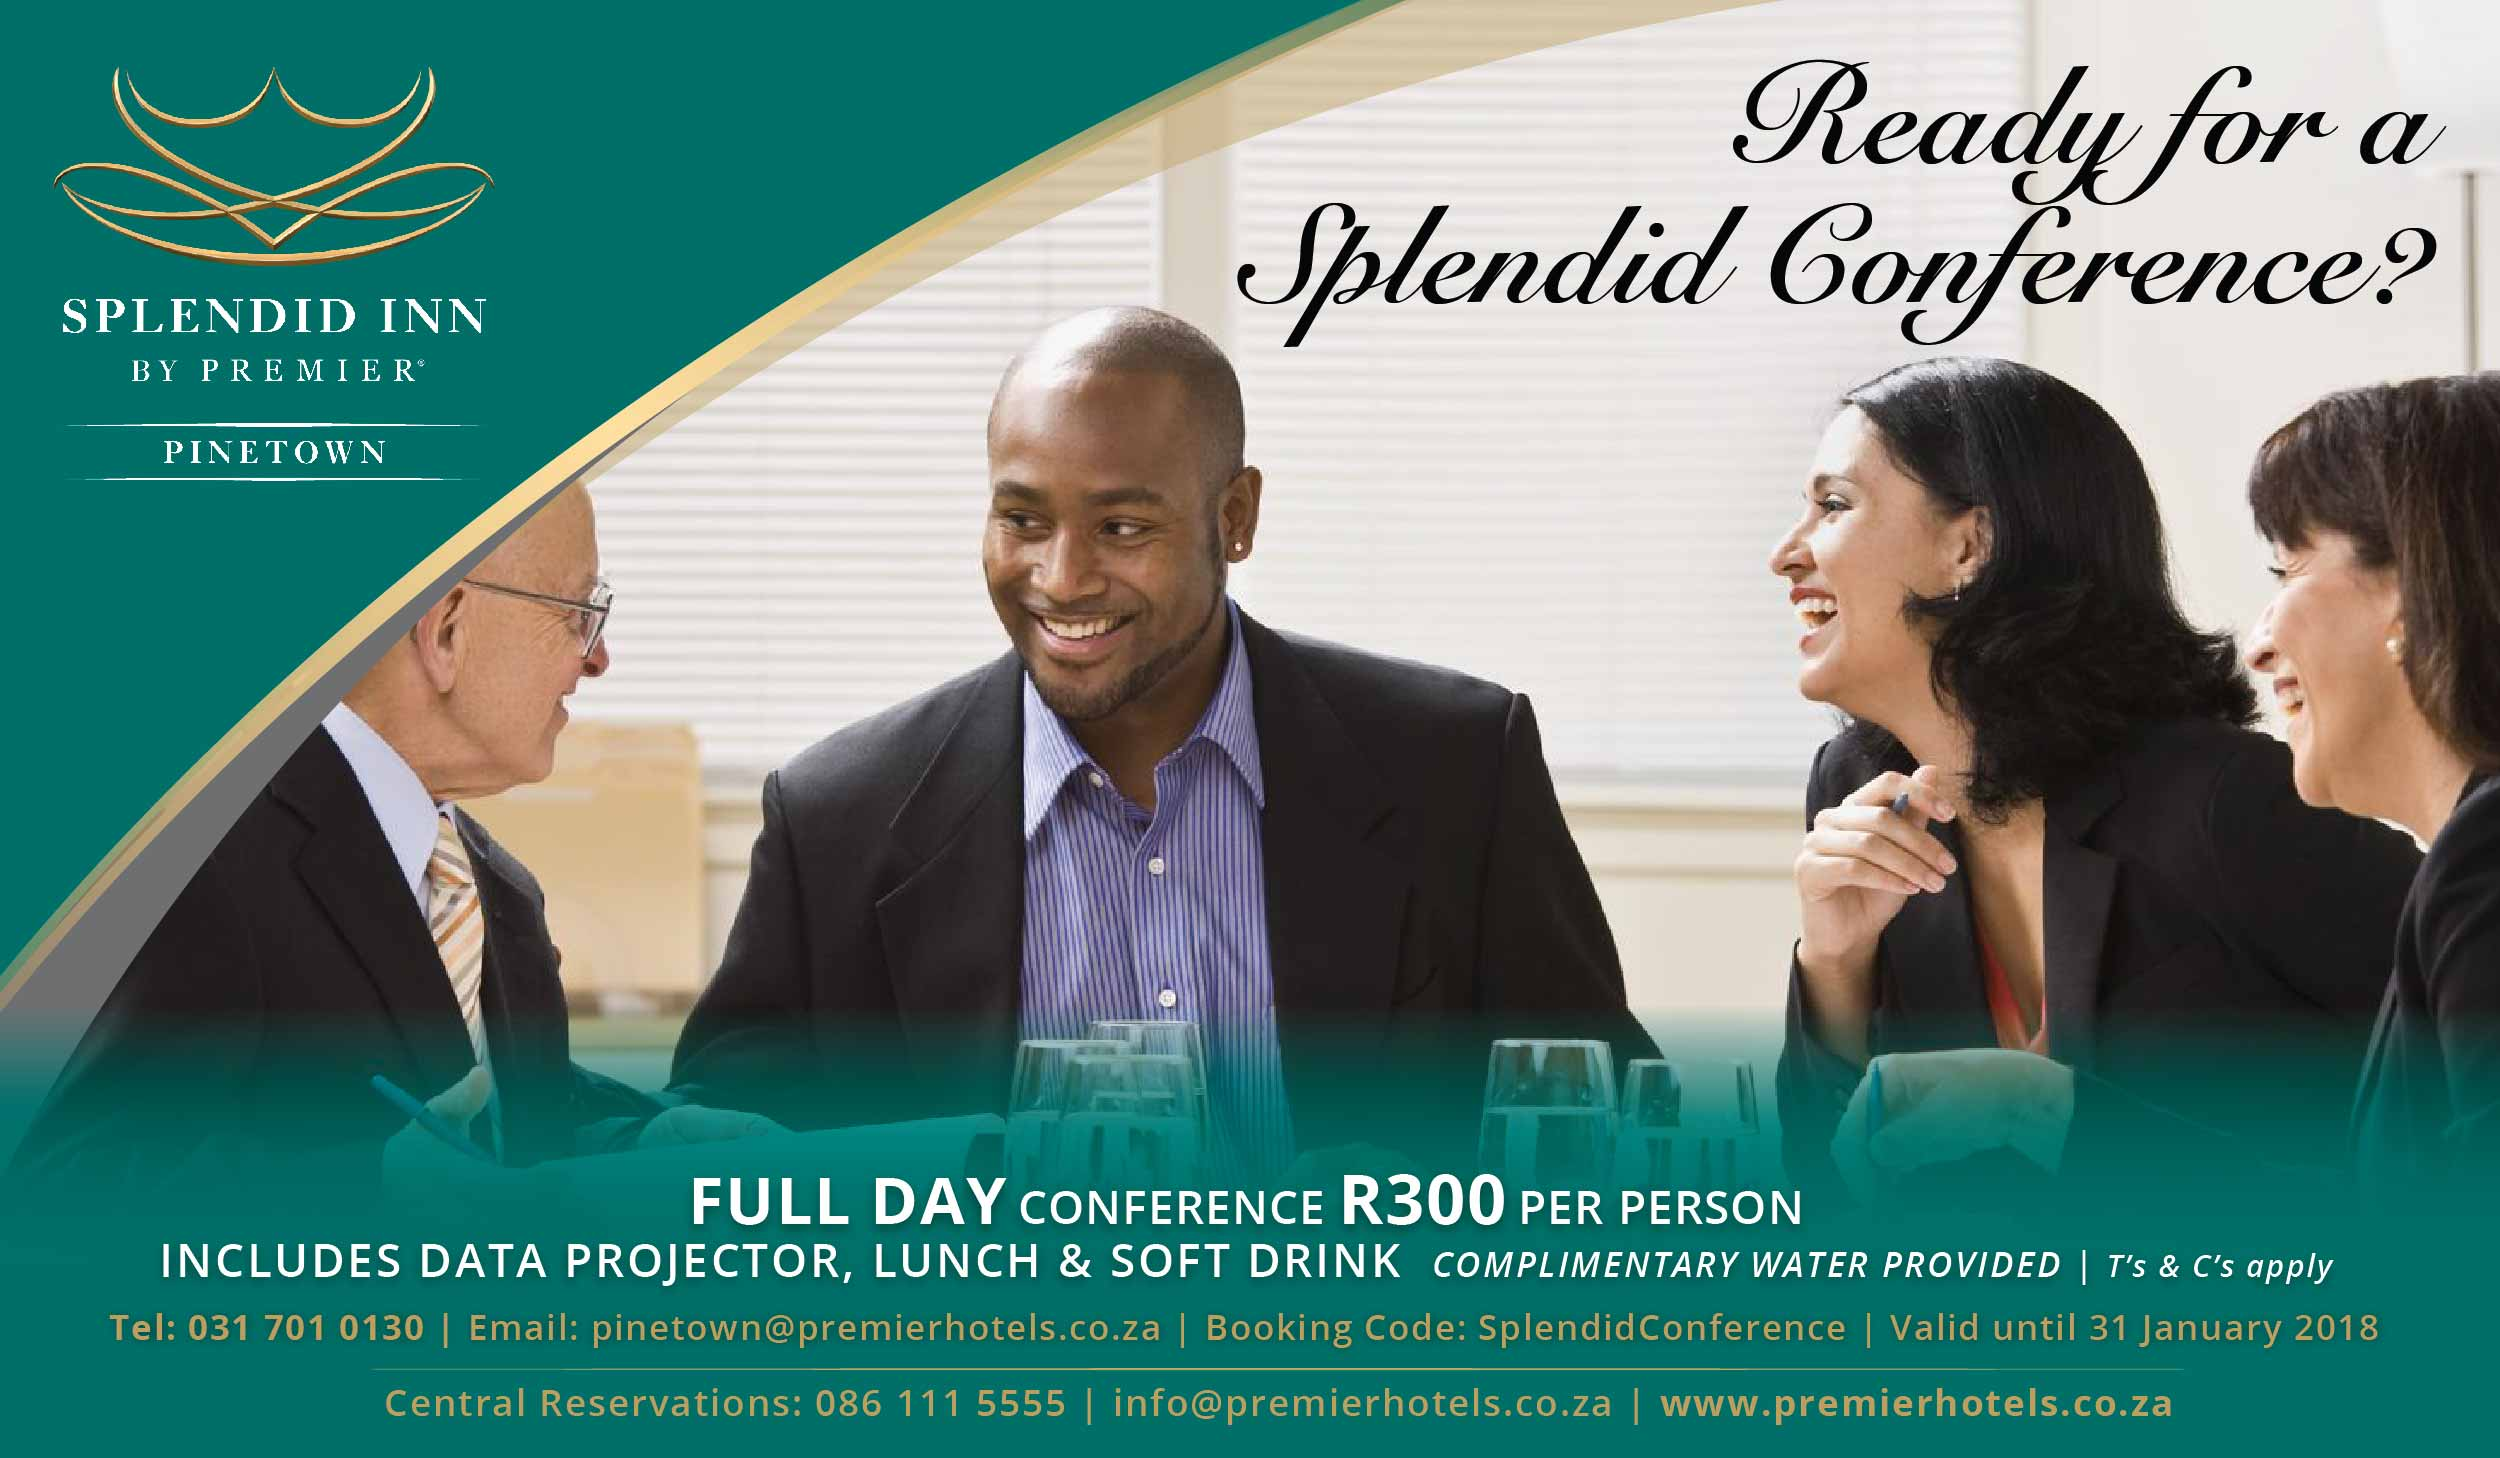 Splendid Inn Pinetown Conference Special